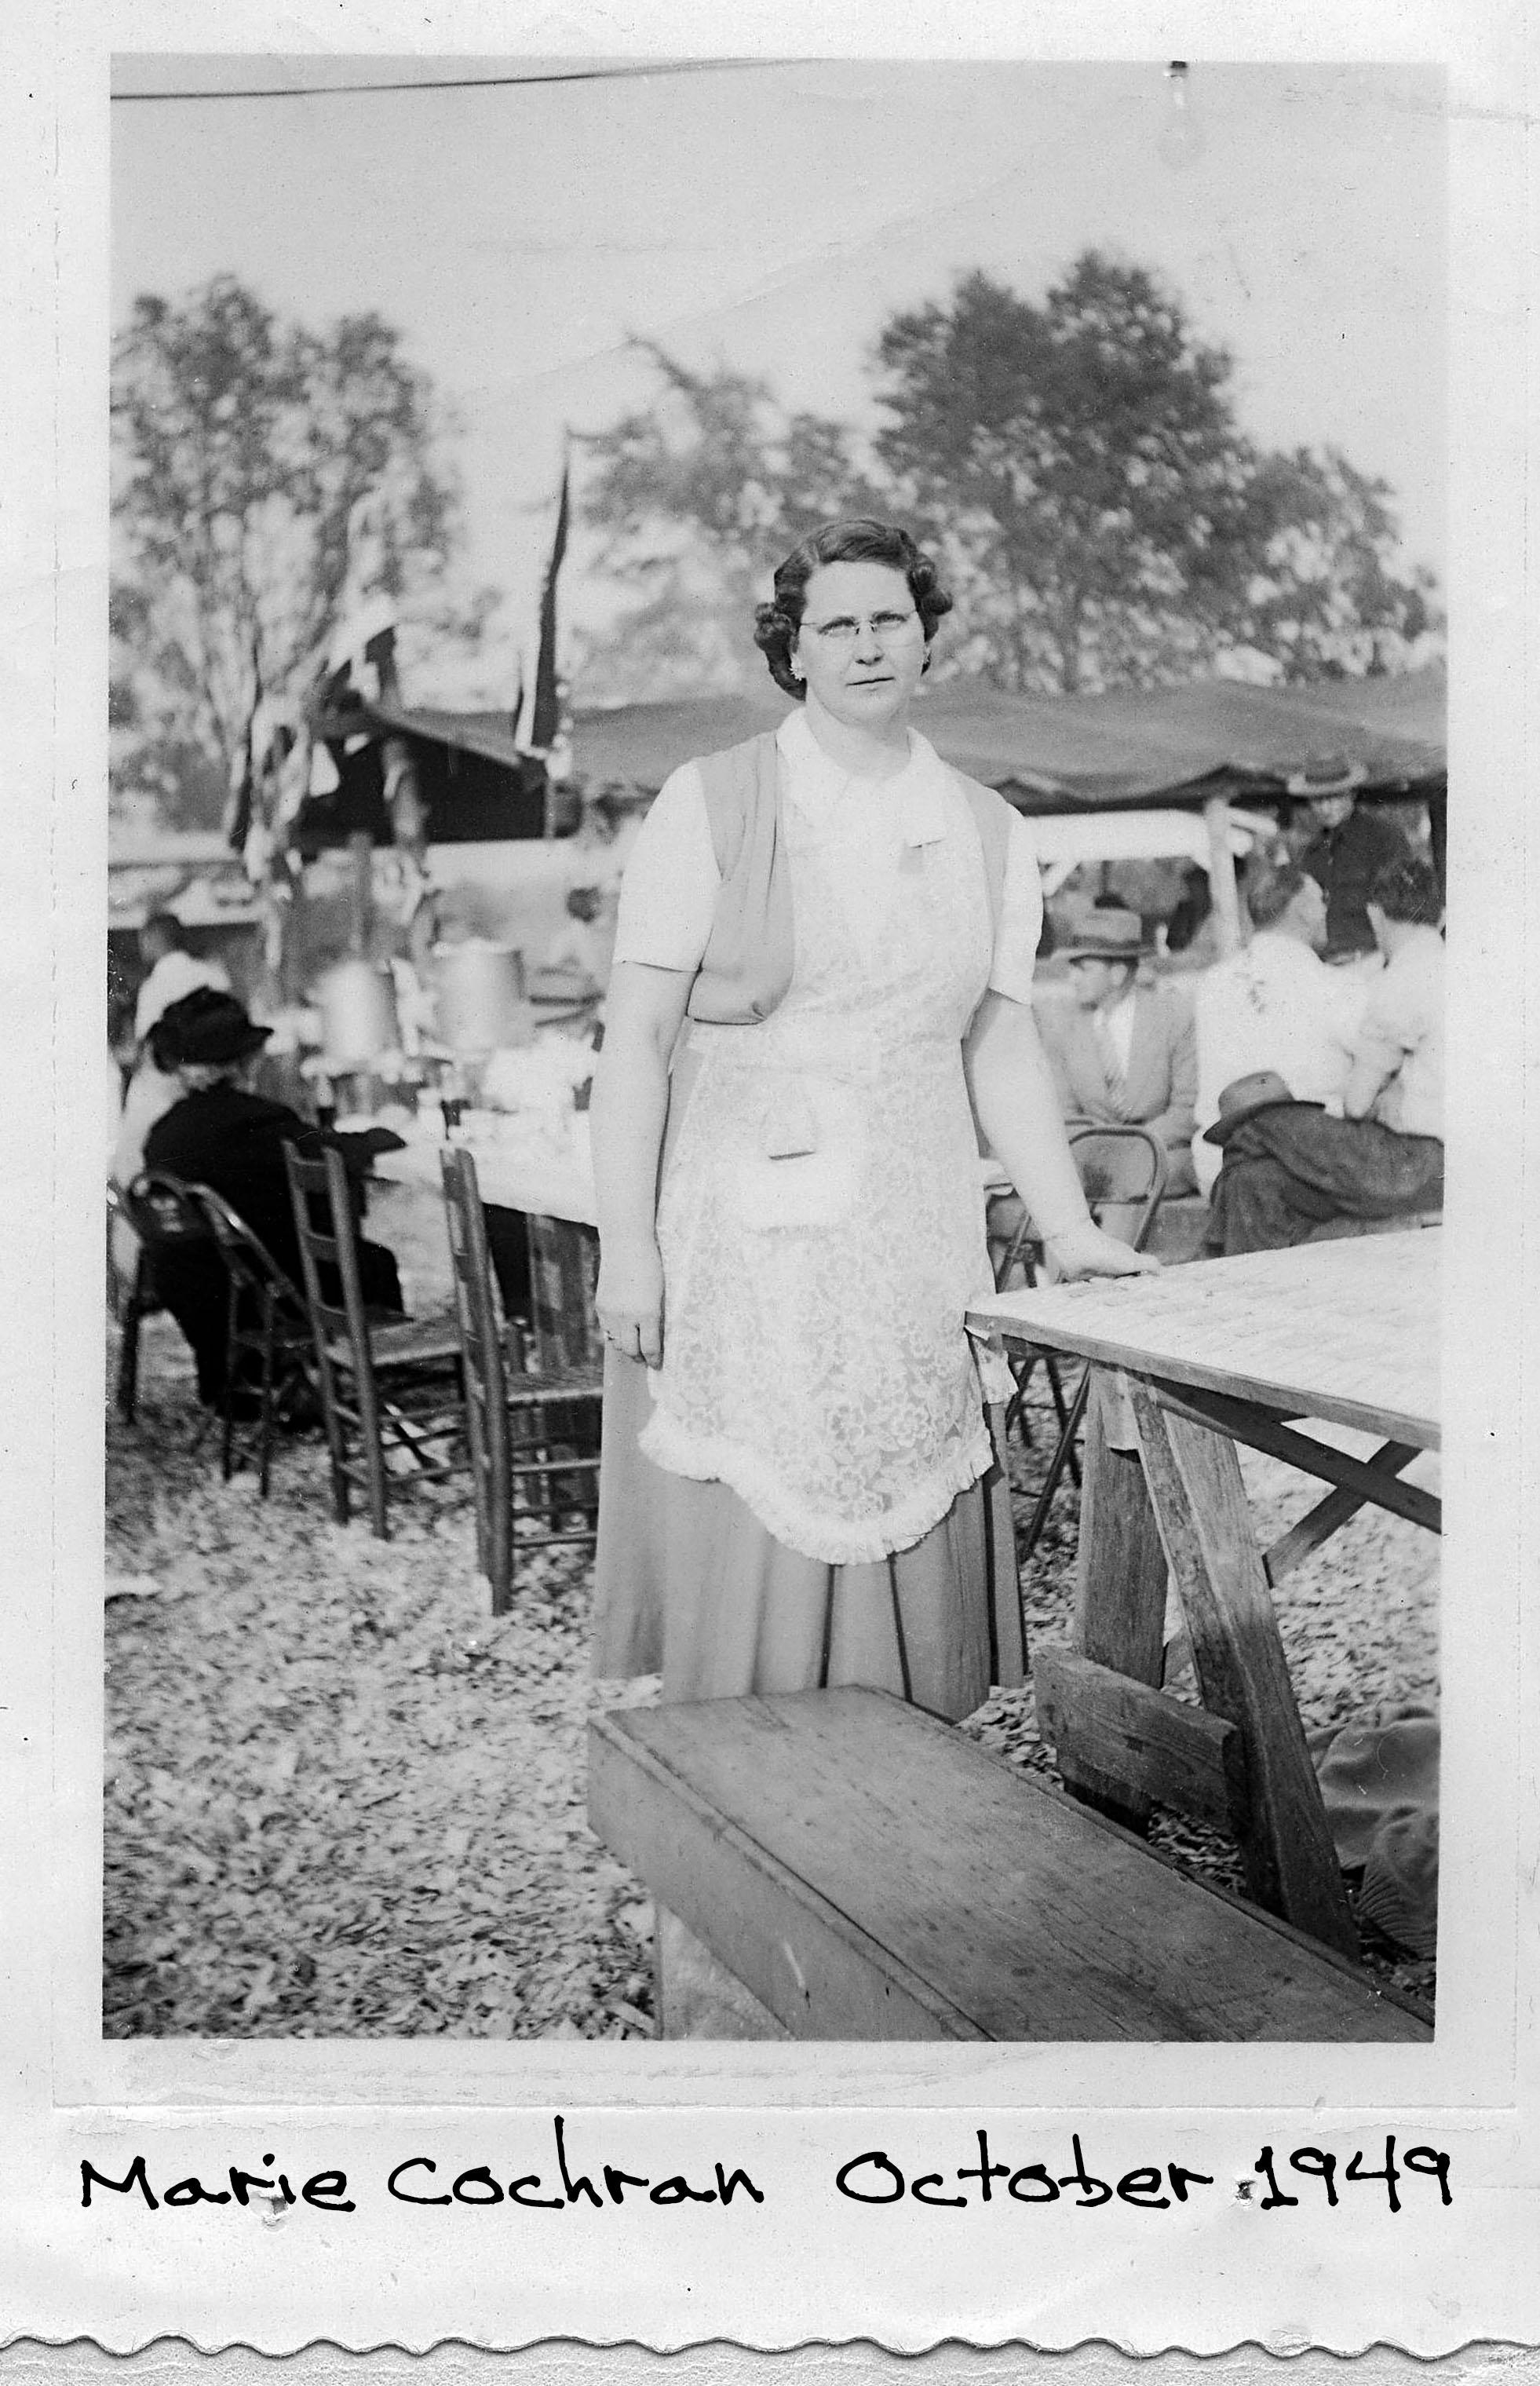 Marie G. Cochran 1949